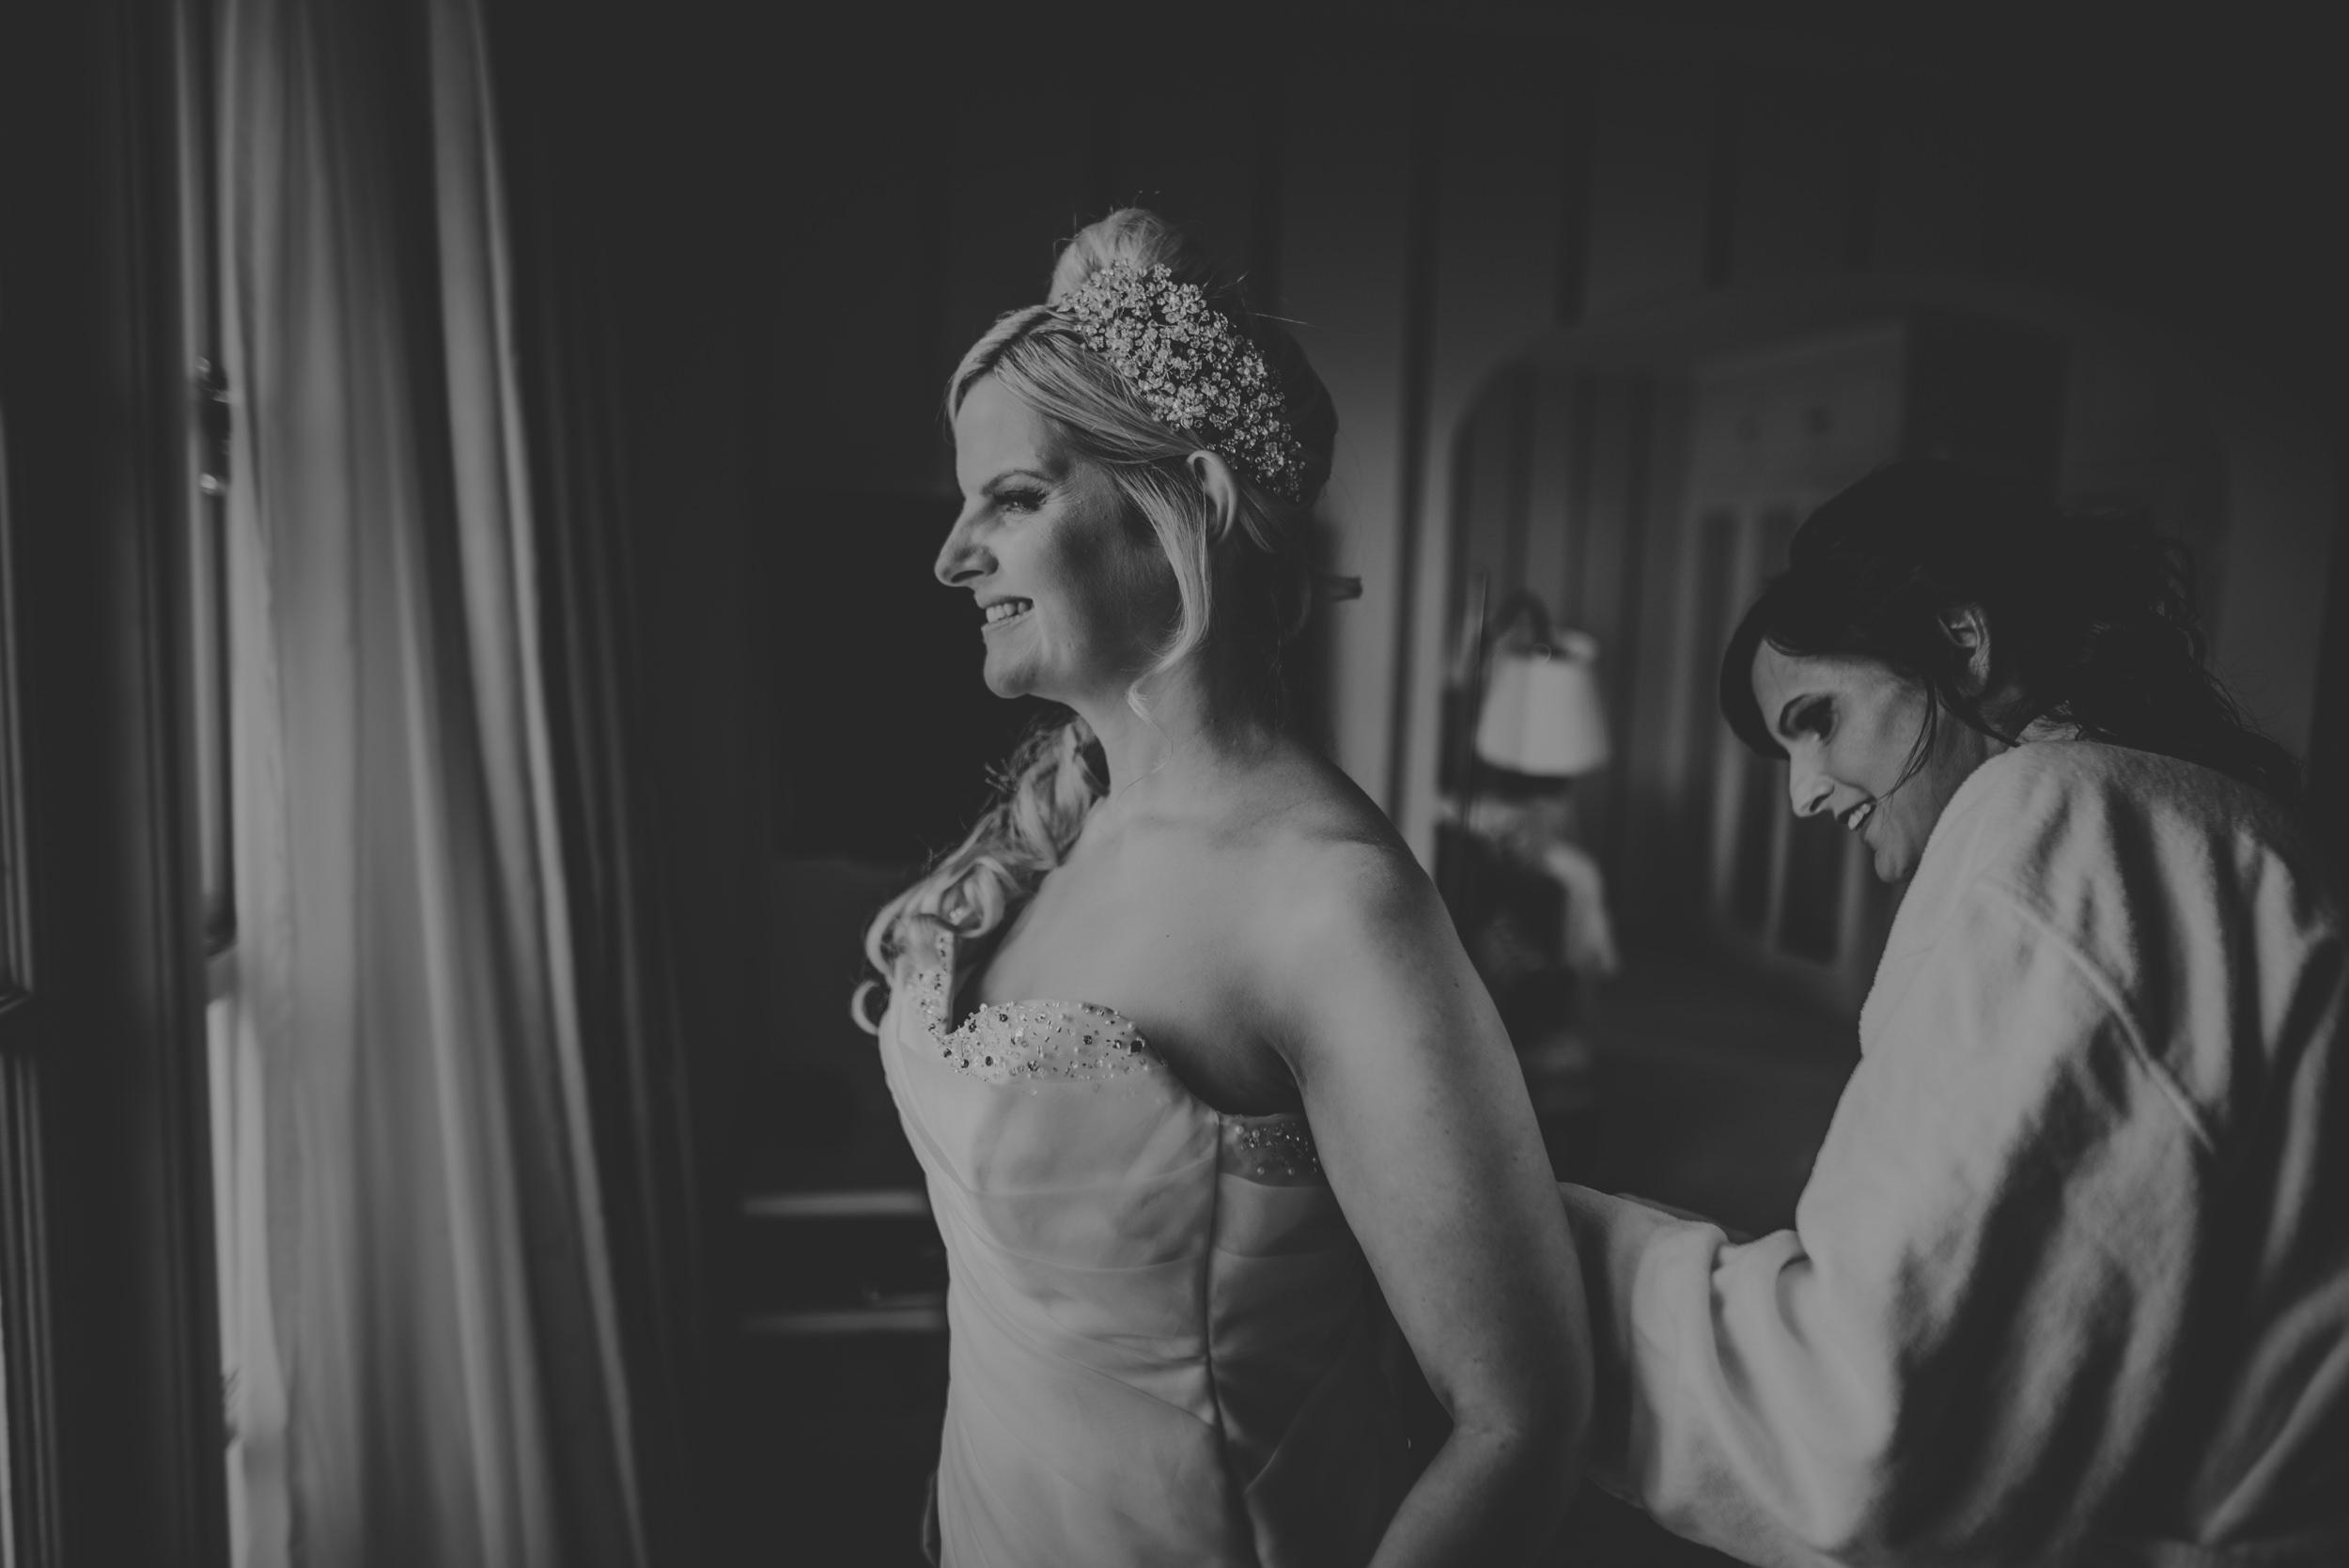 Trisha-and-Roger-wedding-The-Priory-Church-and-Chewton-Glen-Hotel-Christchurch-Manu-Mendoza-Wedding-Photography-044.jpg